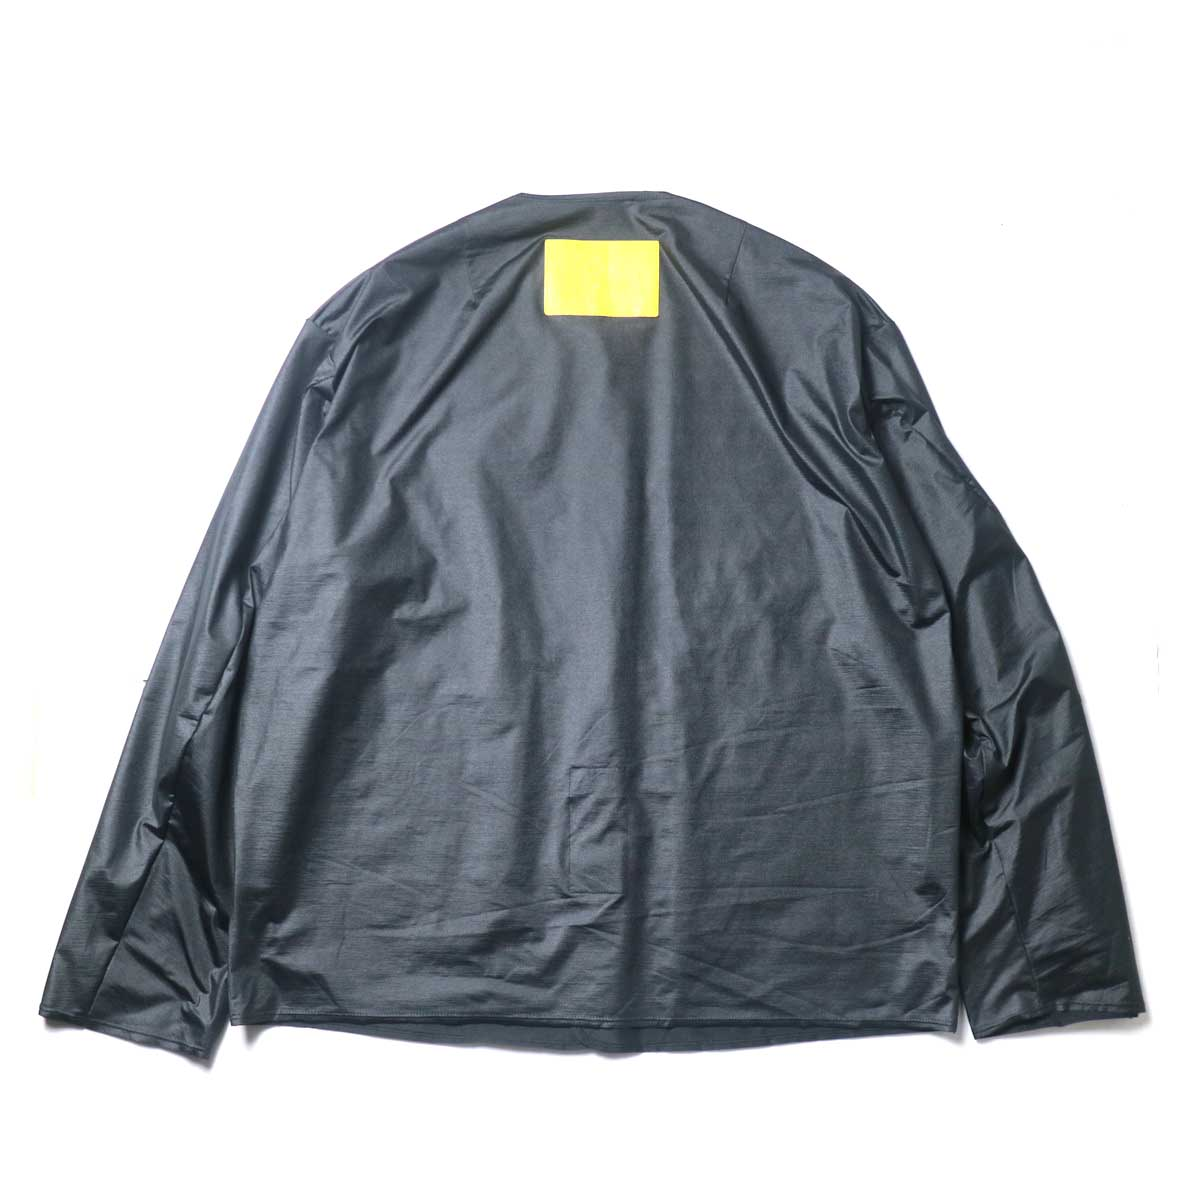 N.HOOLYWOOD / 9211-SH07-010 pieces Shirt Cardigan (Black)背面